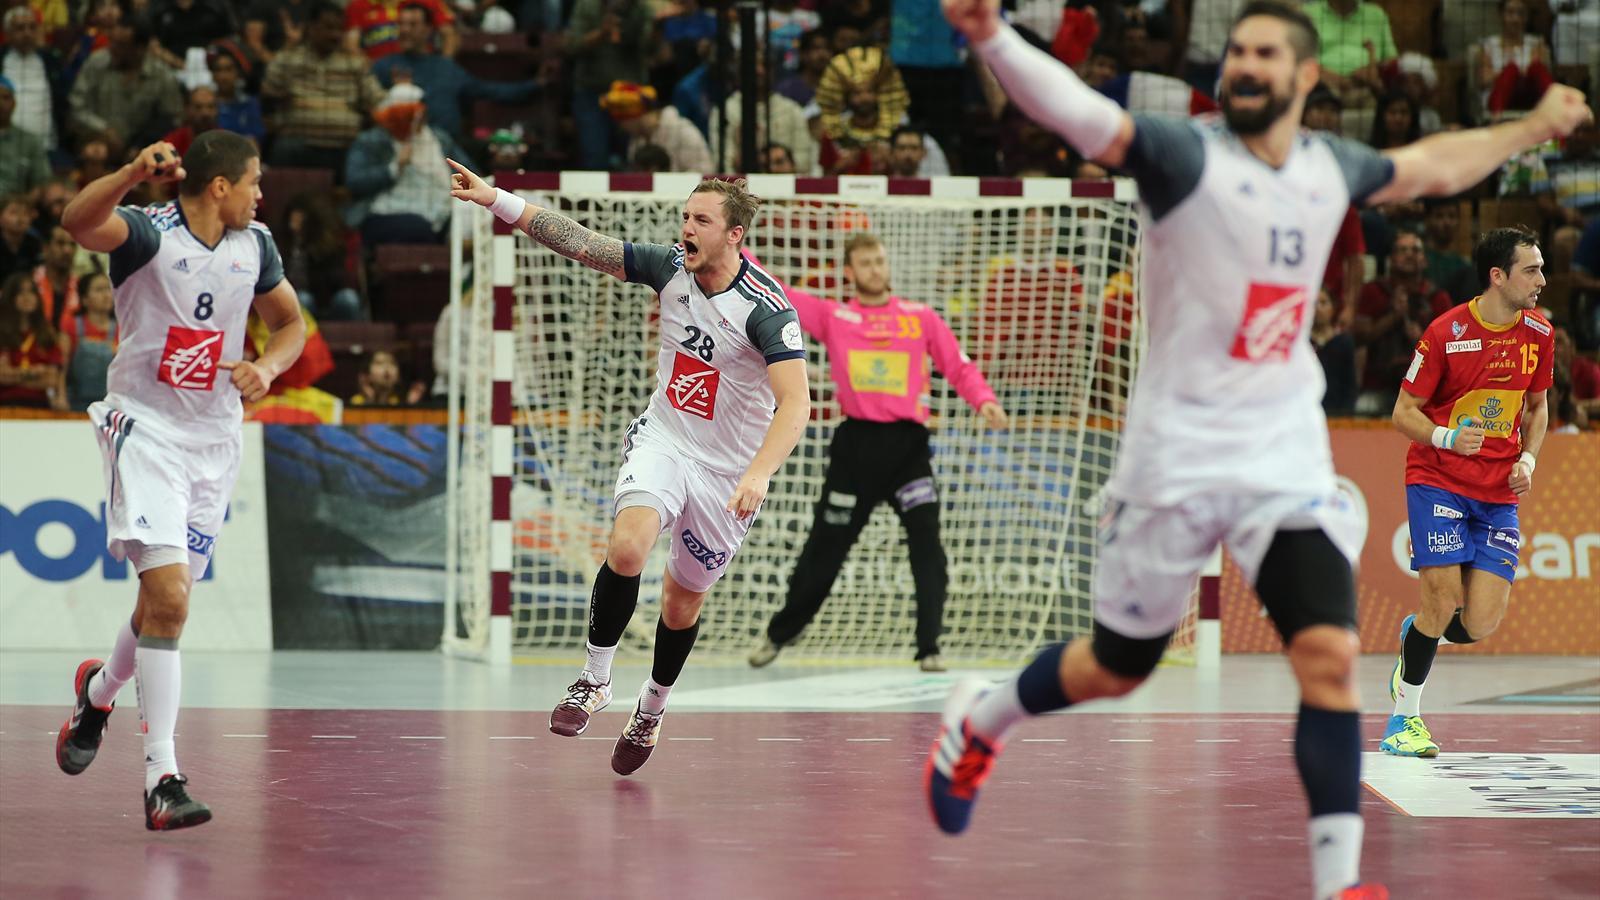 Handball mondial 2015 la france qualifi e pour la finale apr s sa victoire face l 39 espagne - Coupe du monde 2015 handball ...